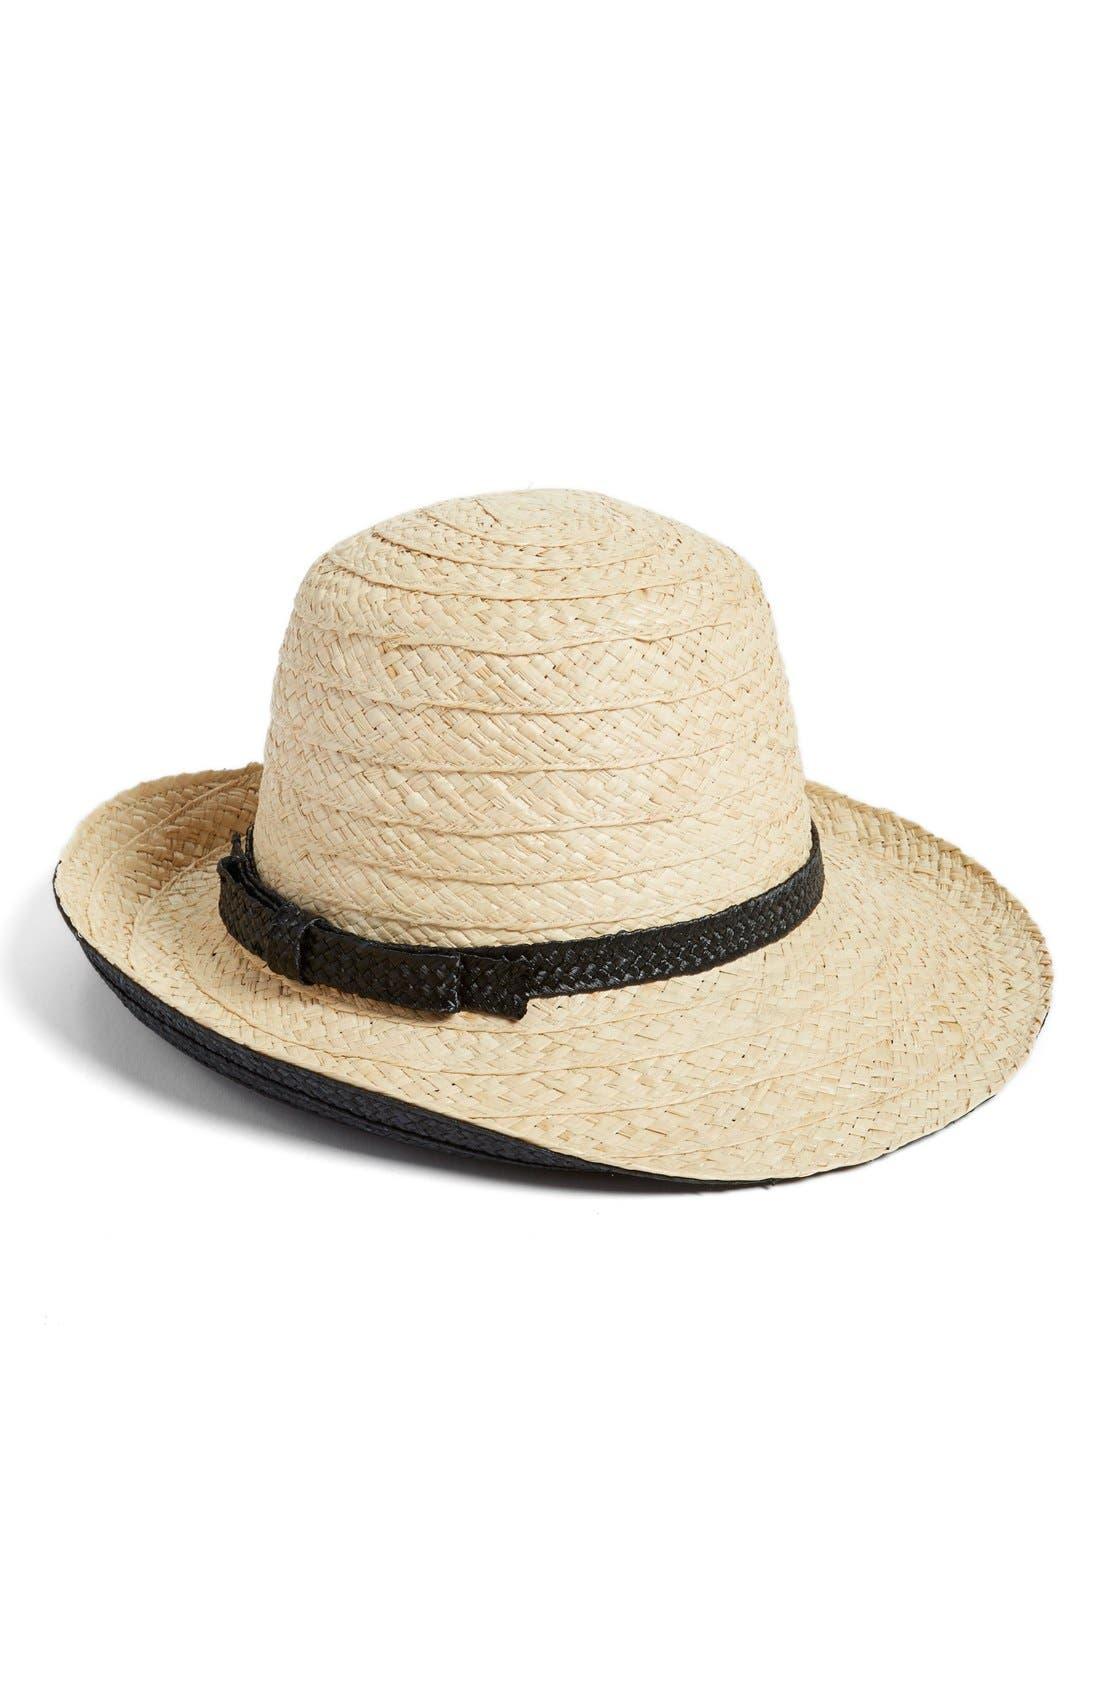 Alternate Image 1 Selected - kate spade new york asymmetrical sun hat